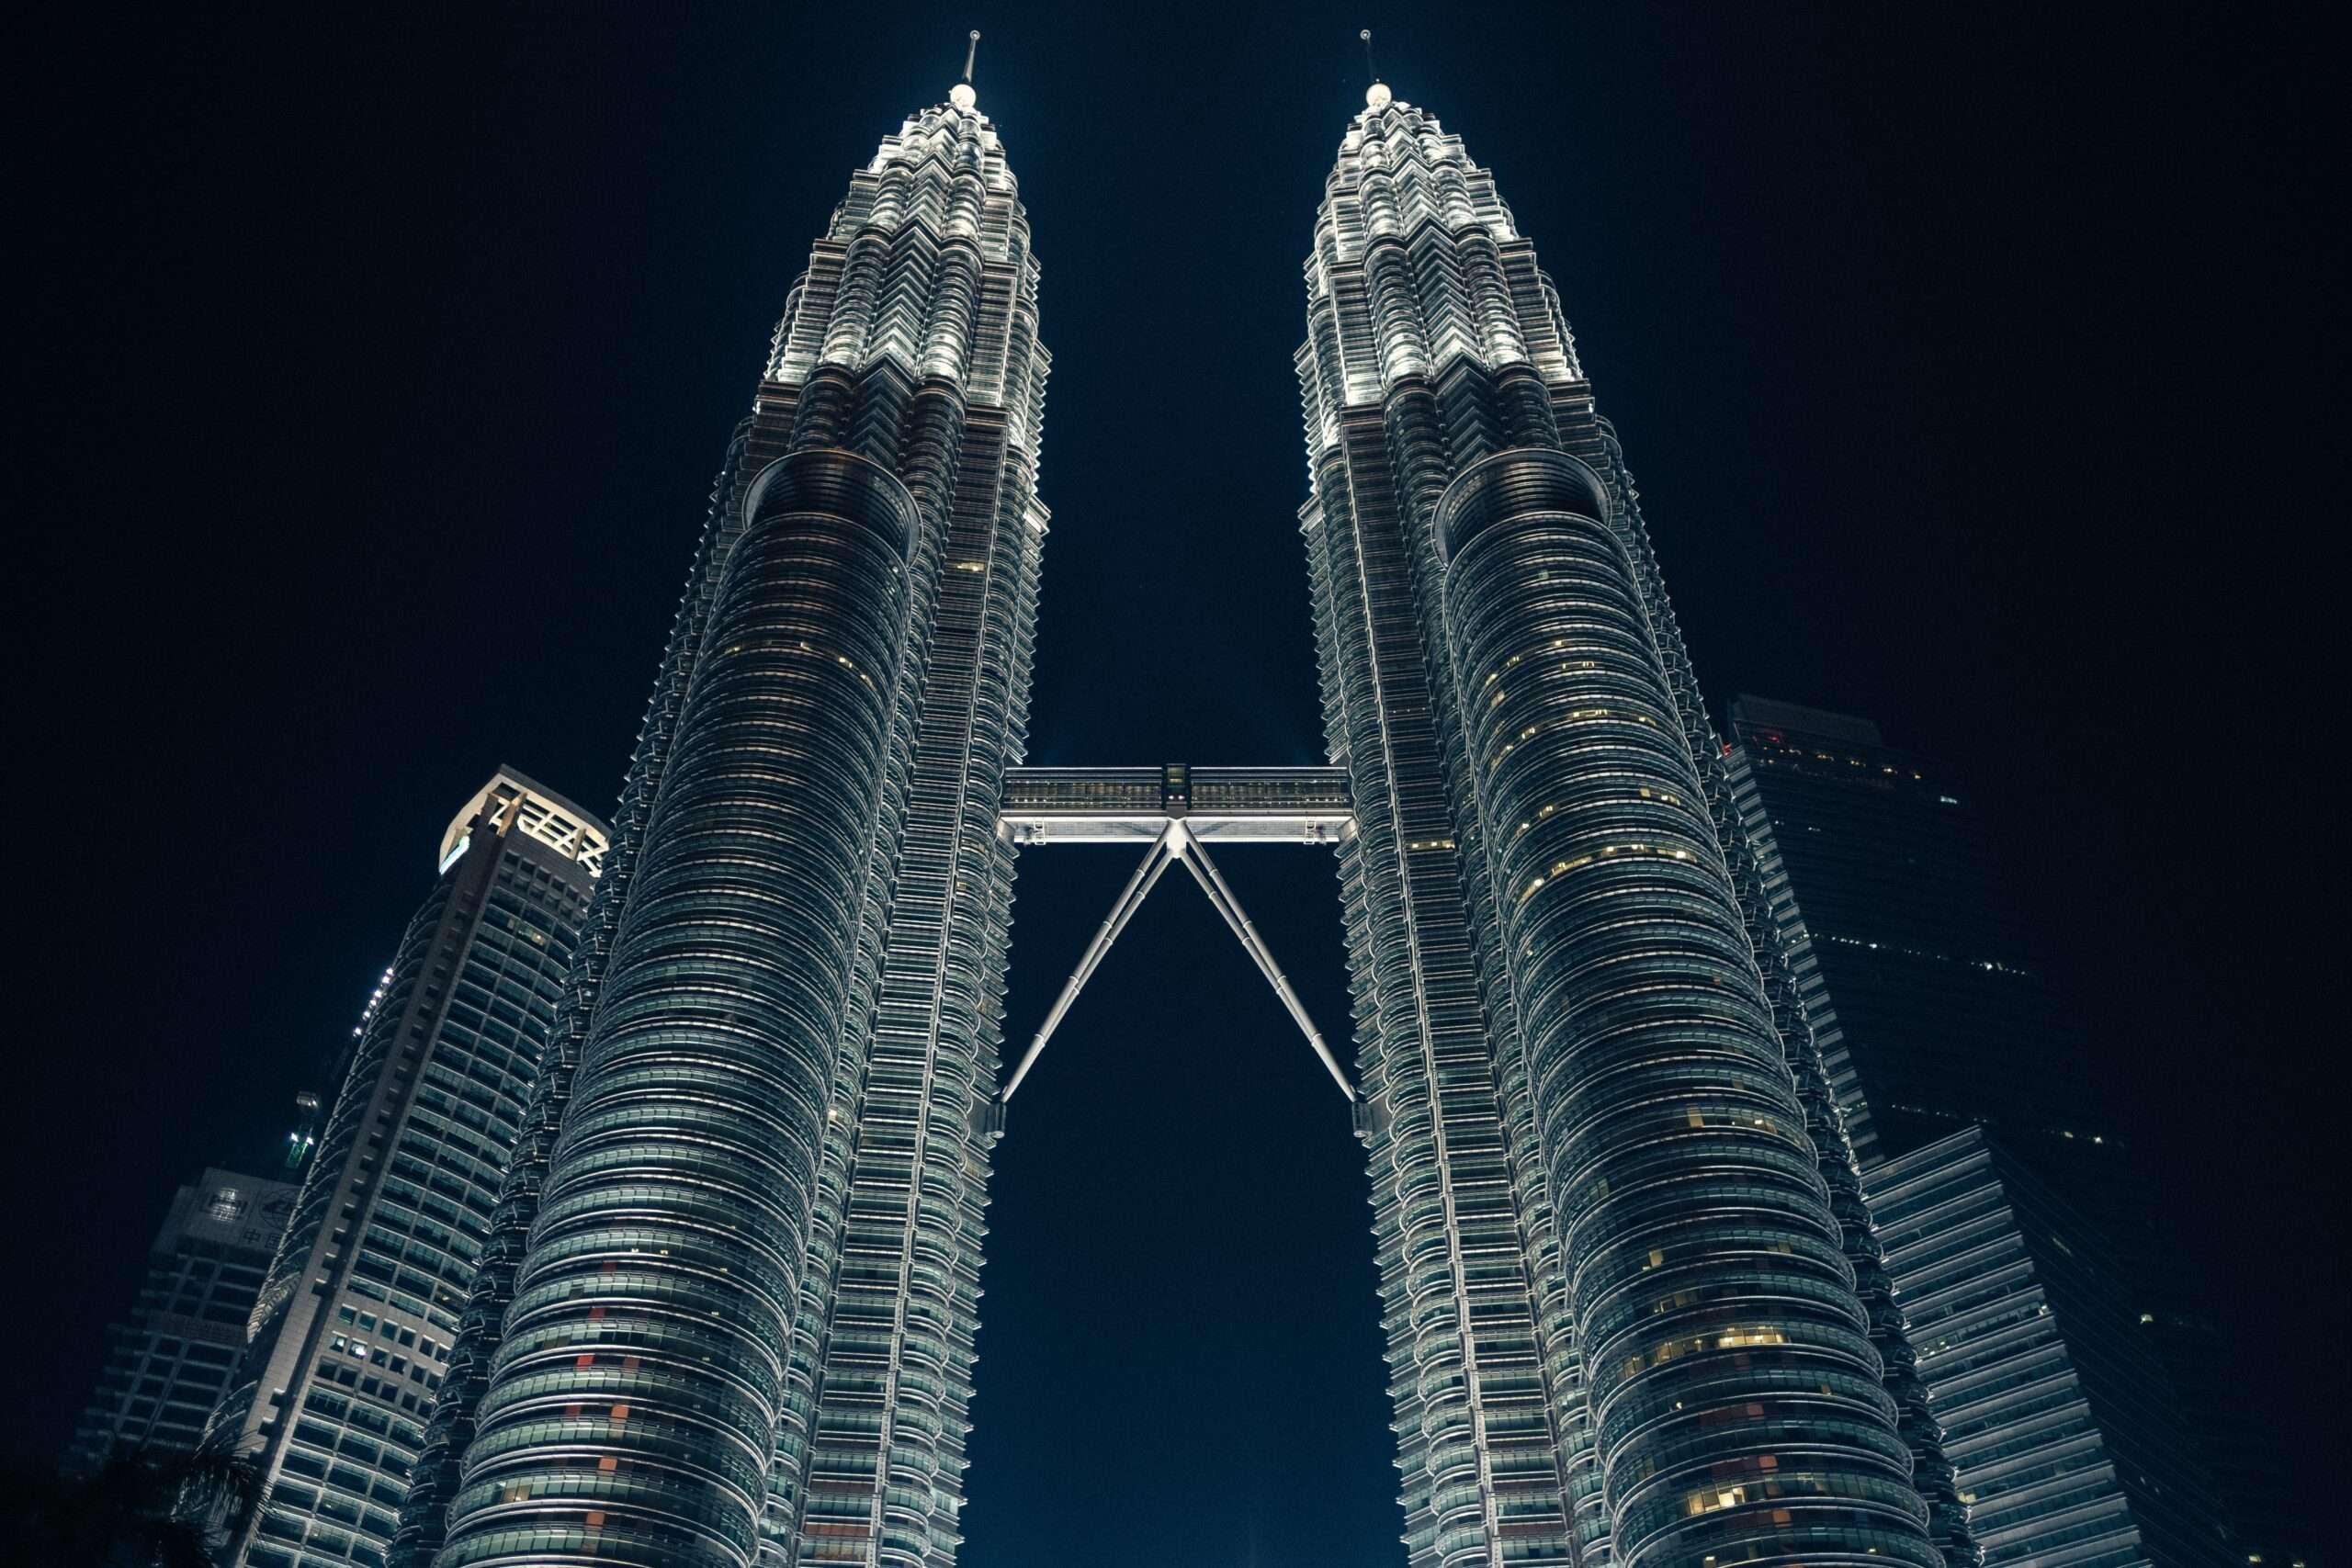 Petronas Twin Towers at night, Kuala Lumpur